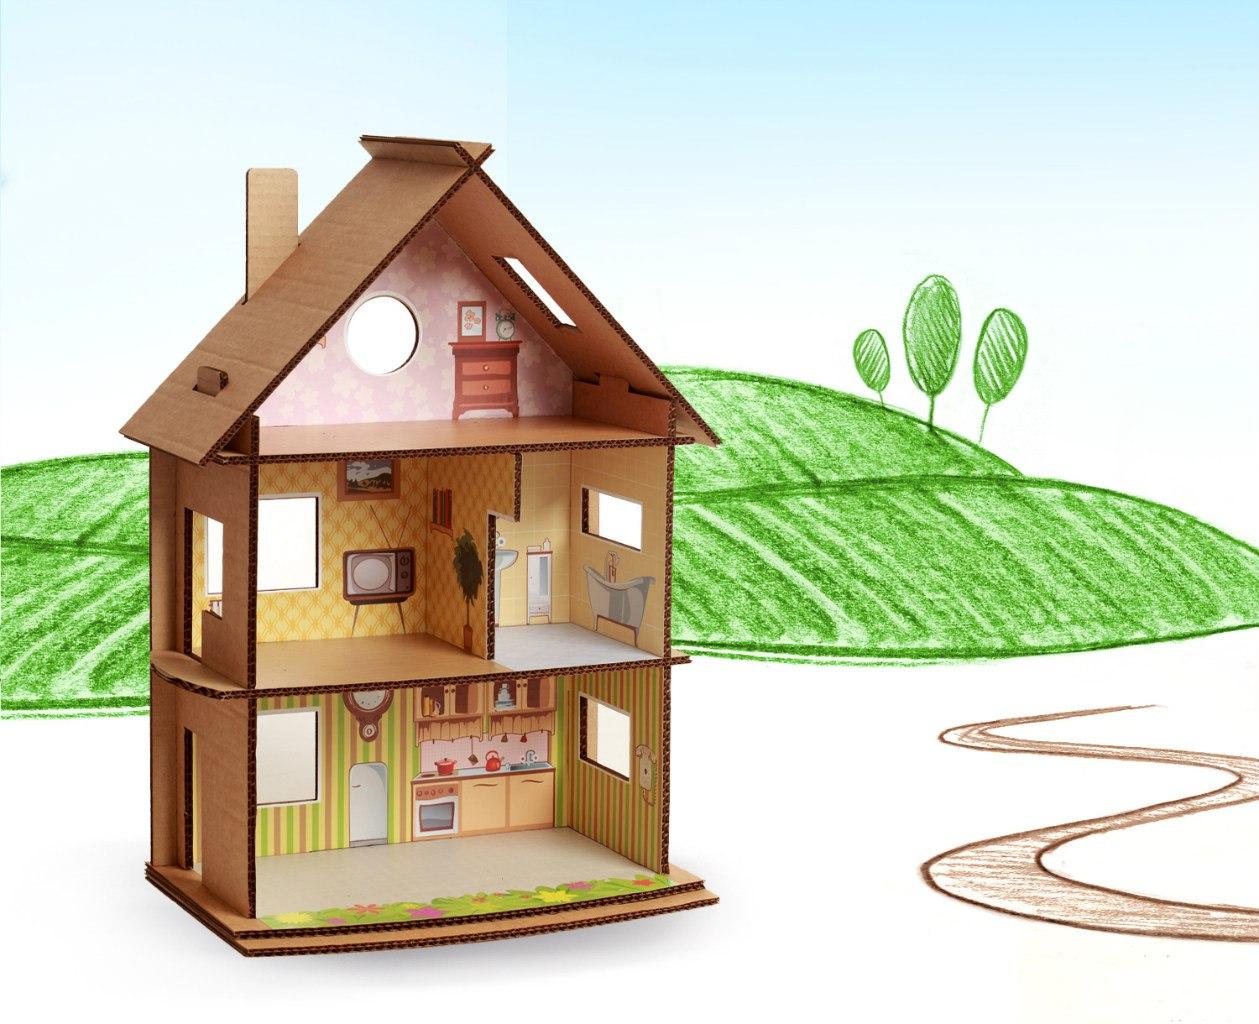 Дома для кукол своими руками из картона